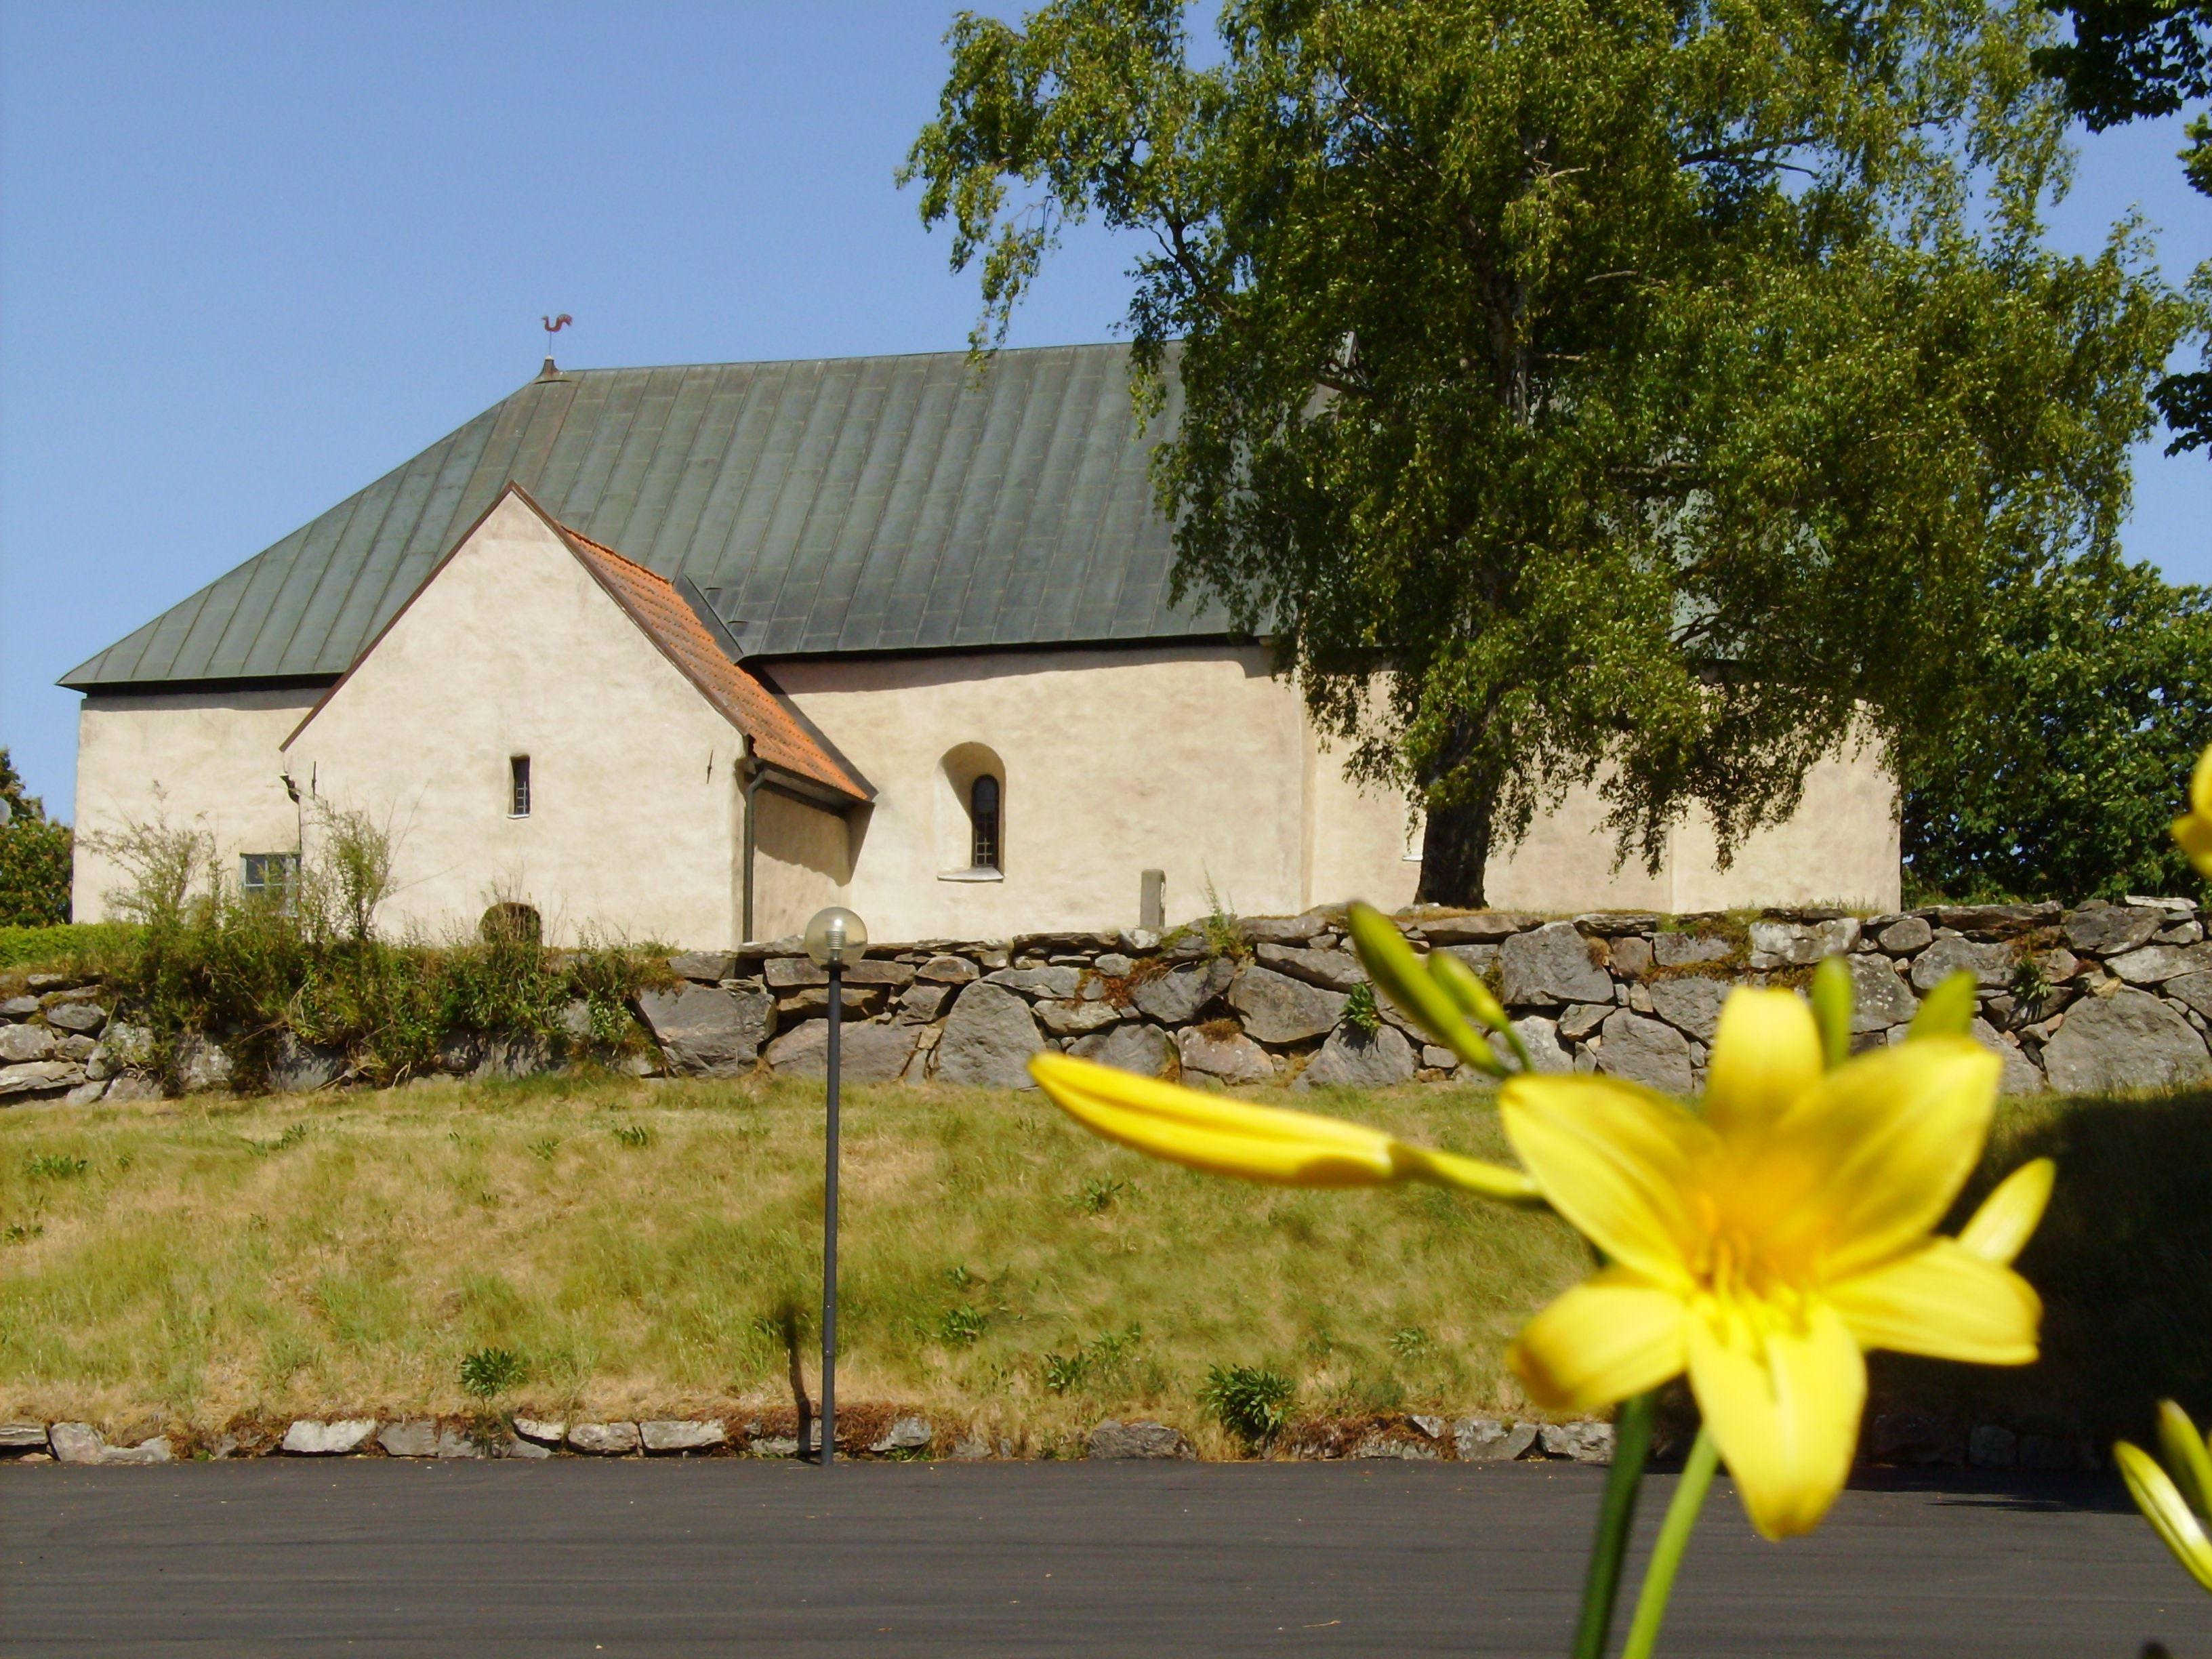 FOTO: Linda Nilsson, Ignaberga gamla kyrka